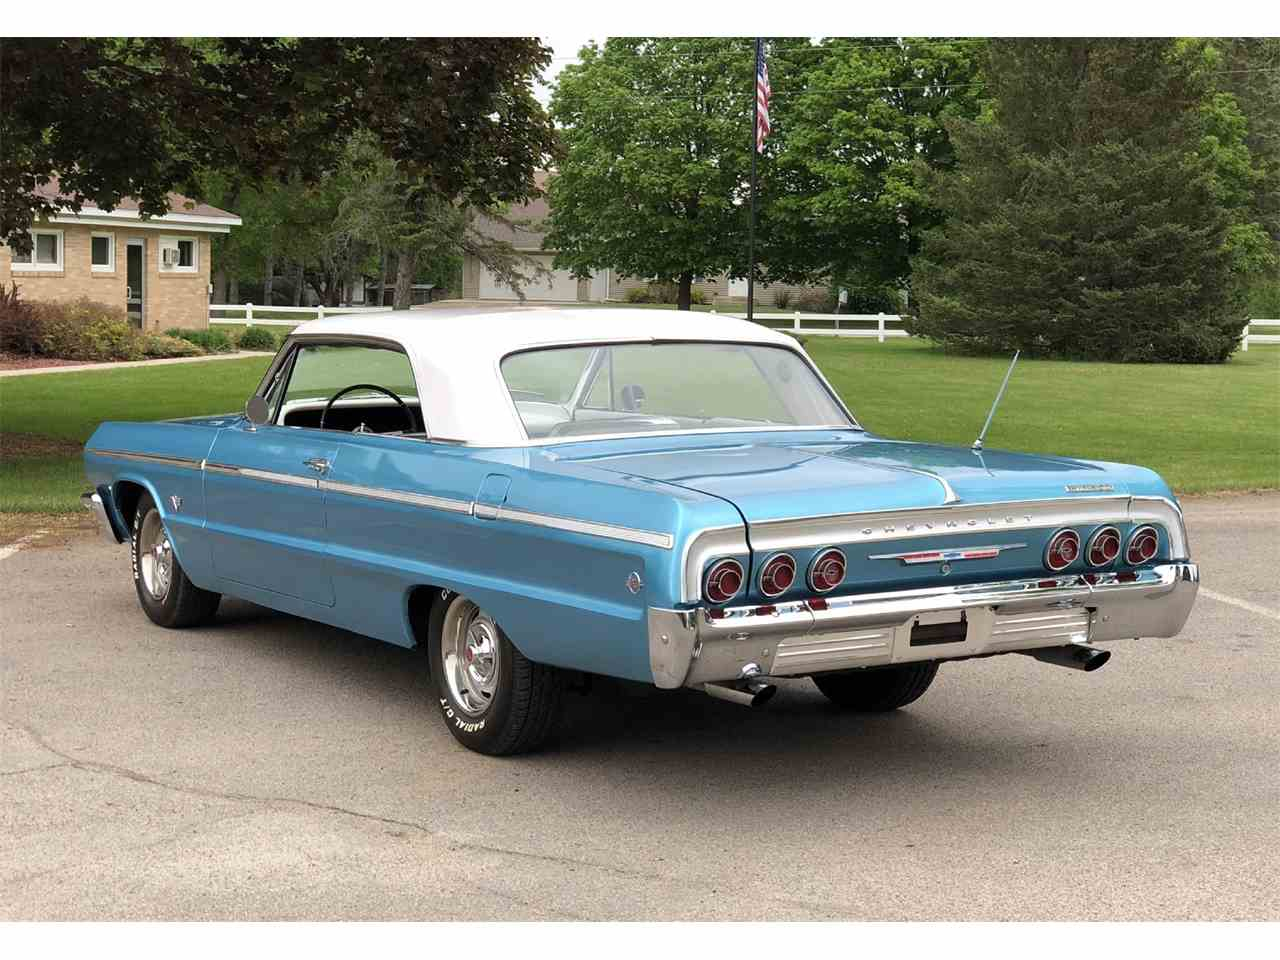 1964 chevrolet impala ss for sale cc 1095677. Black Bedroom Furniture Sets. Home Design Ideas